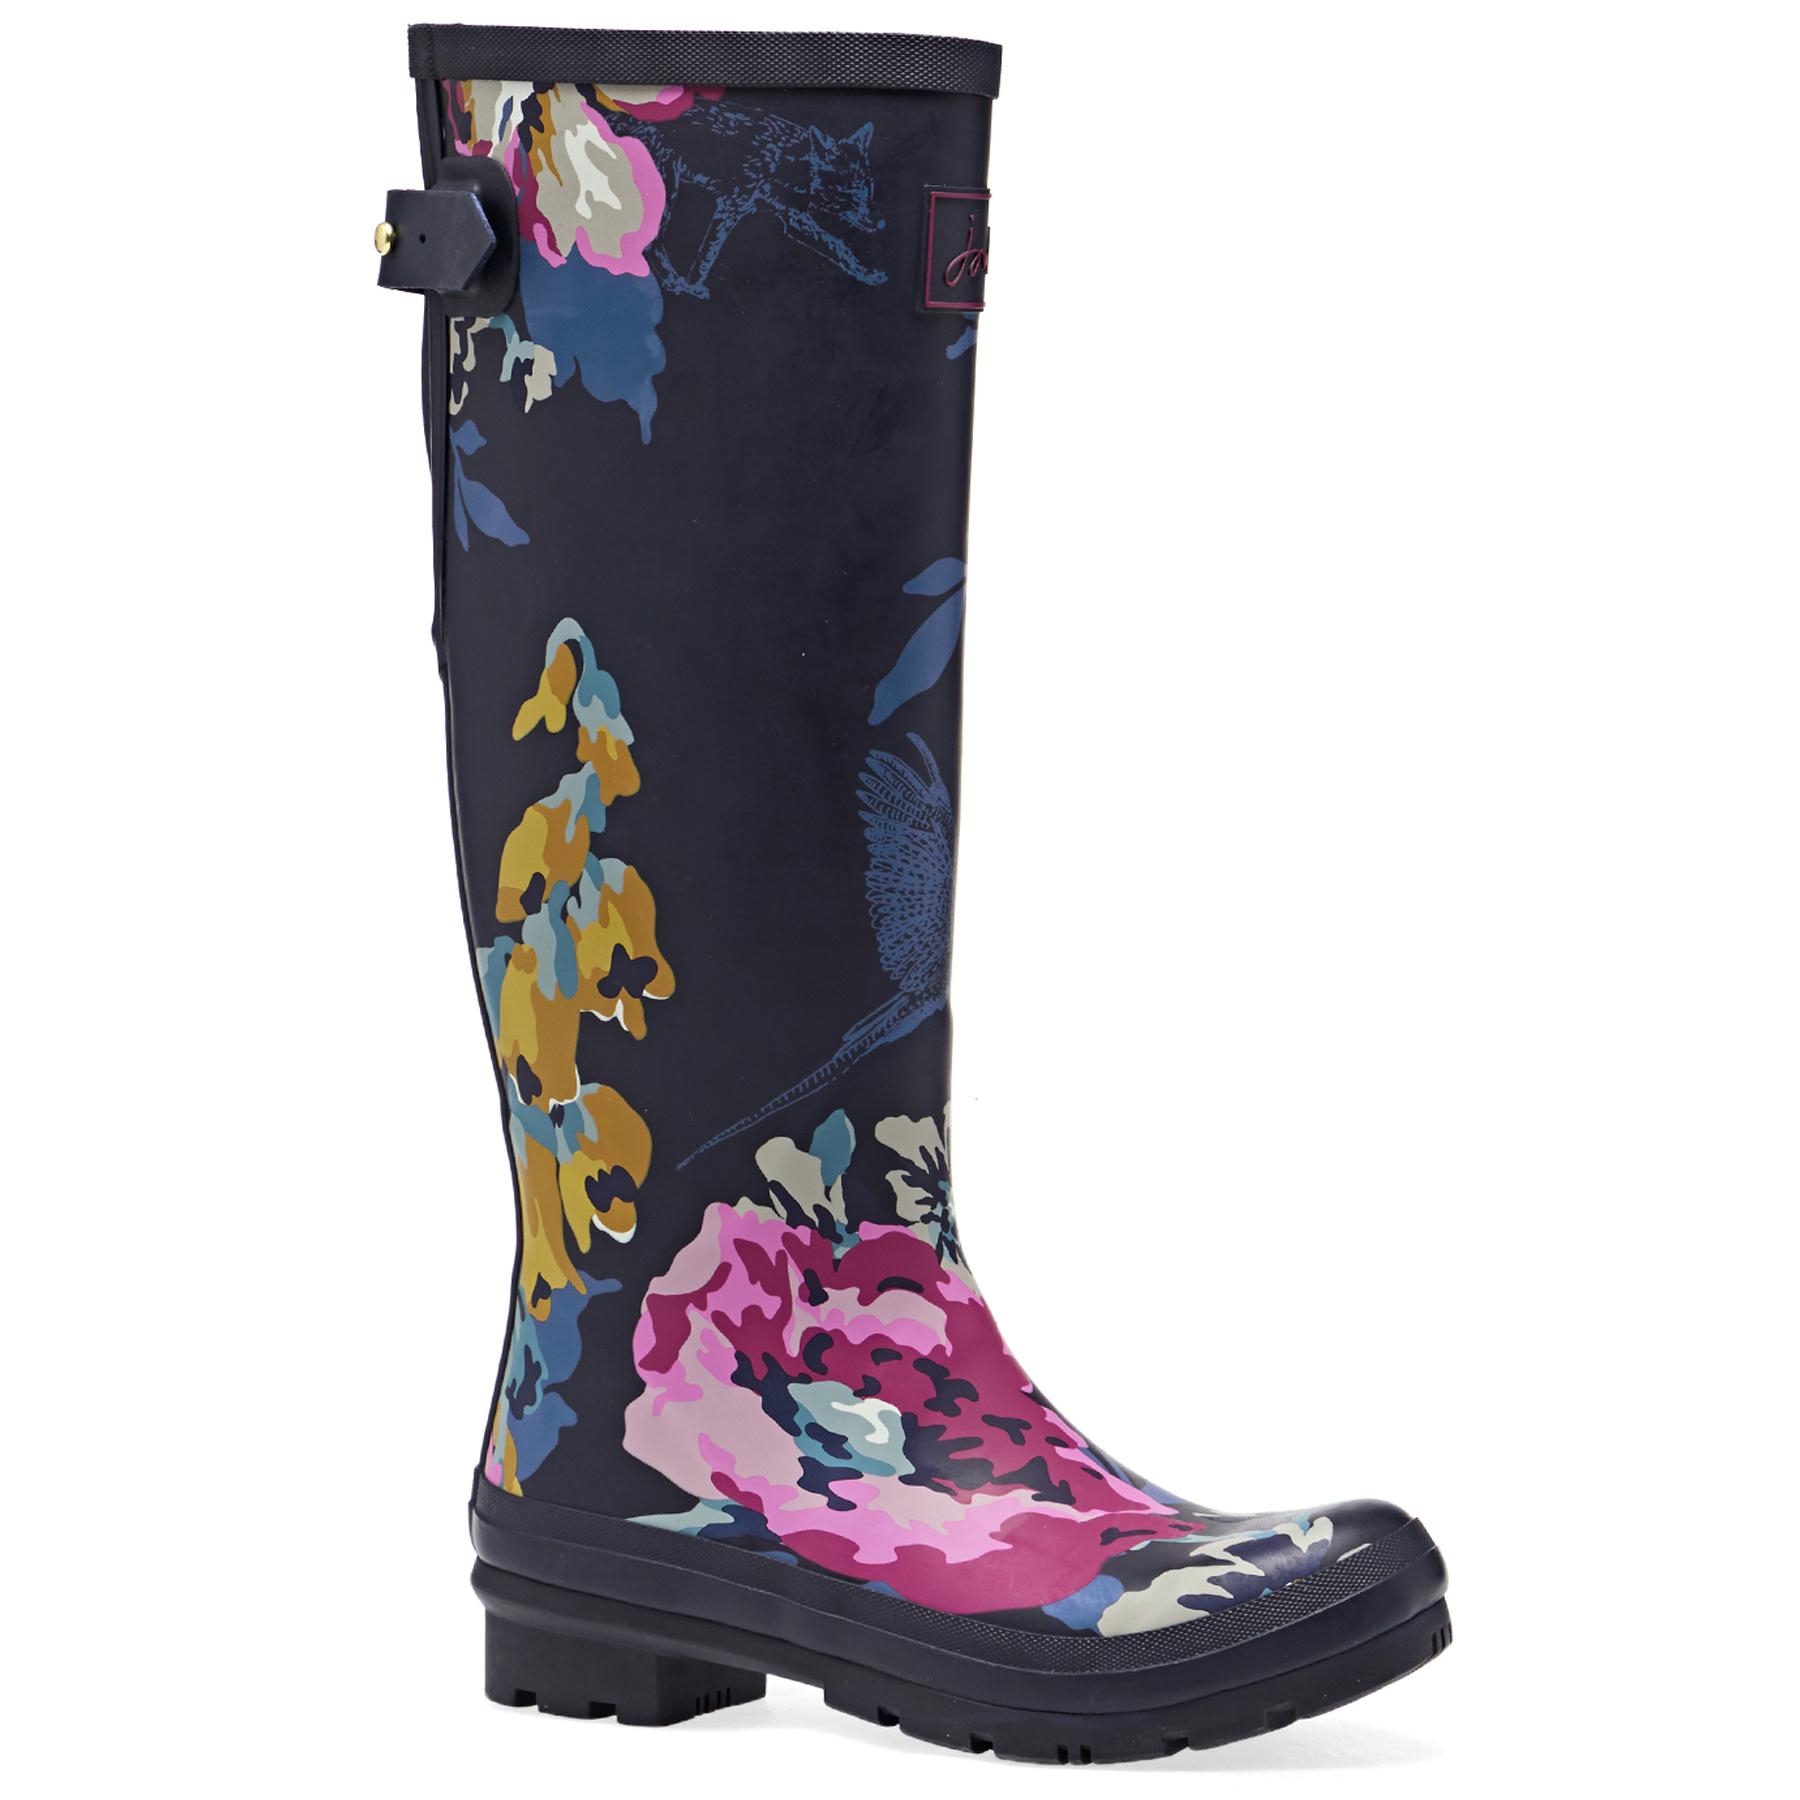 Joules Rainwell Stivali di Gomma Donna